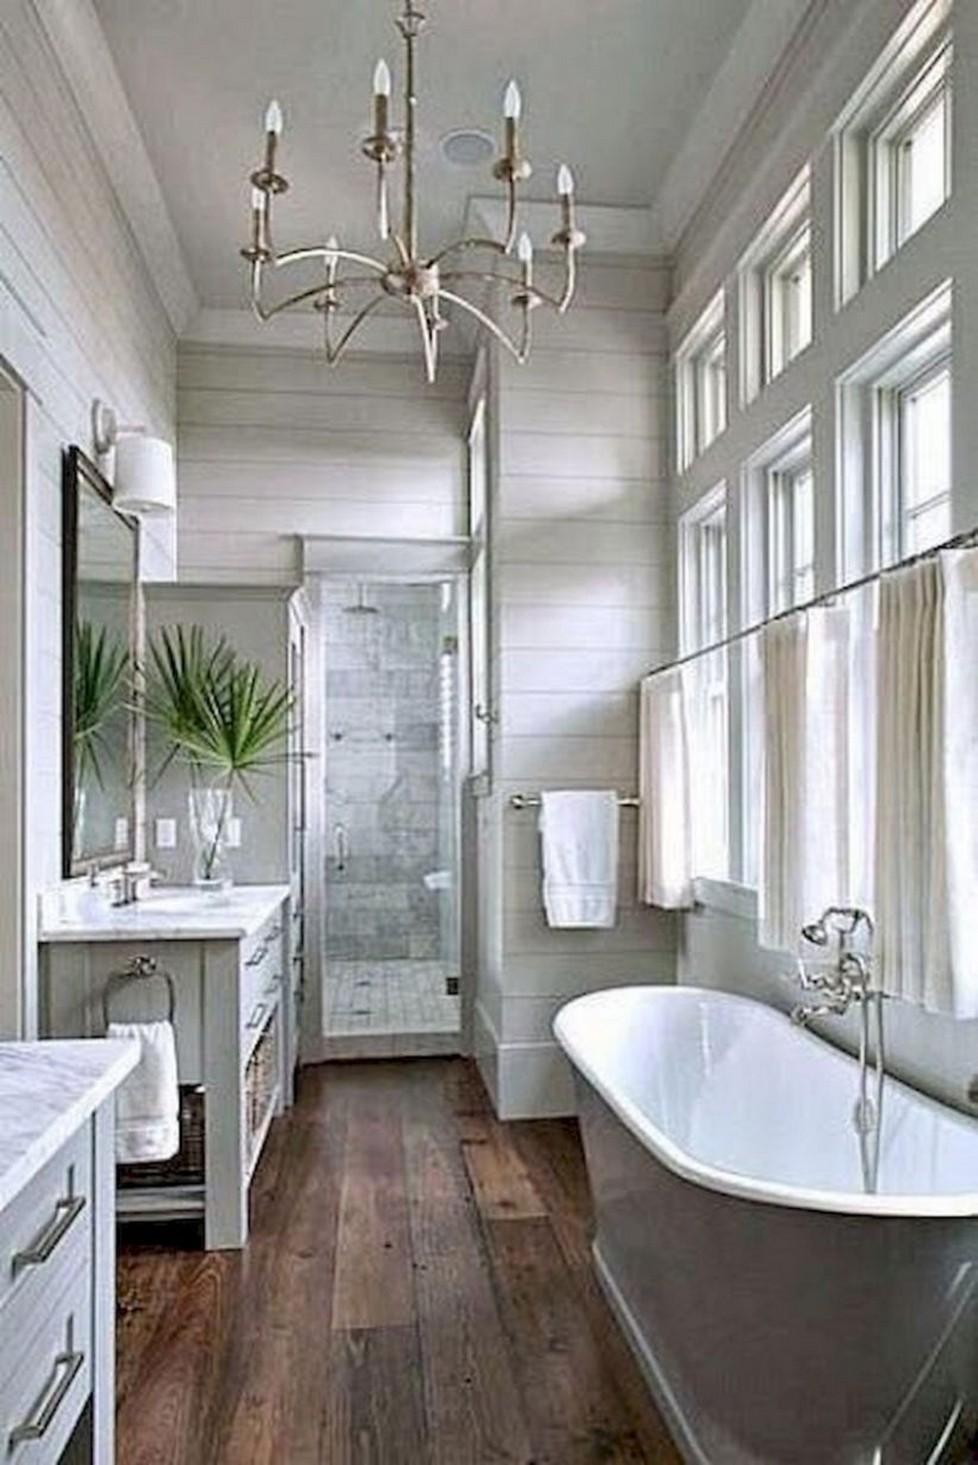 83 Modern Bathroom Design Some Tips Home Decor 25